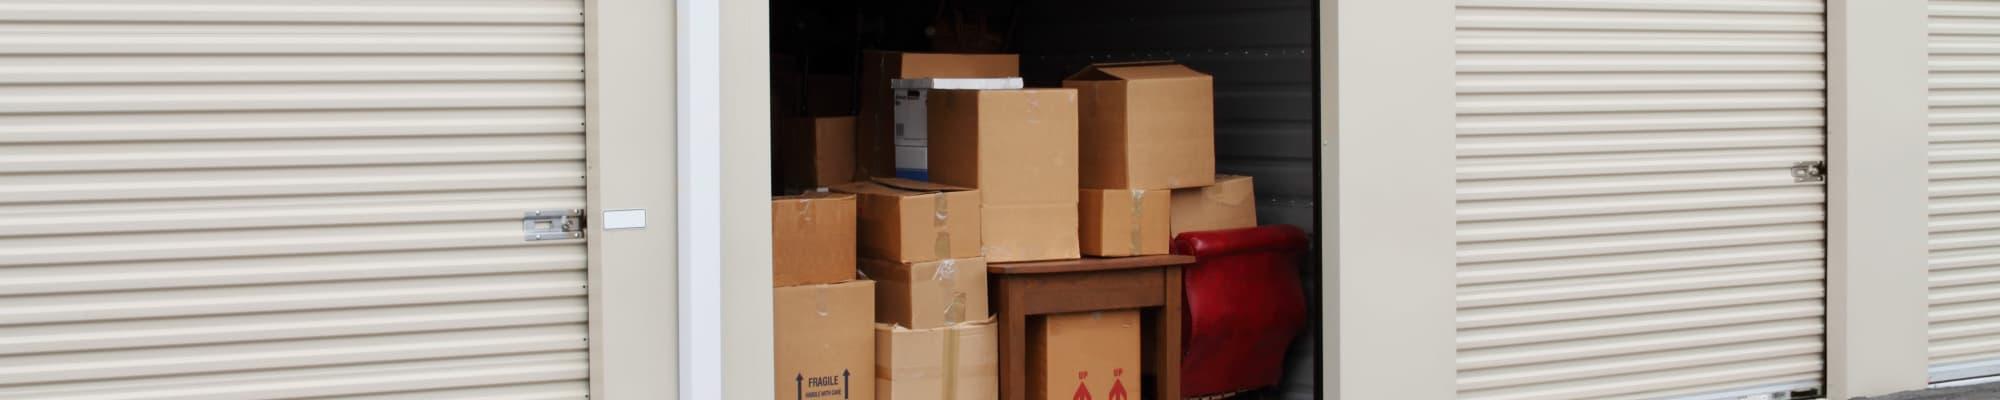 Self storage size guide at Box Self Storage Units